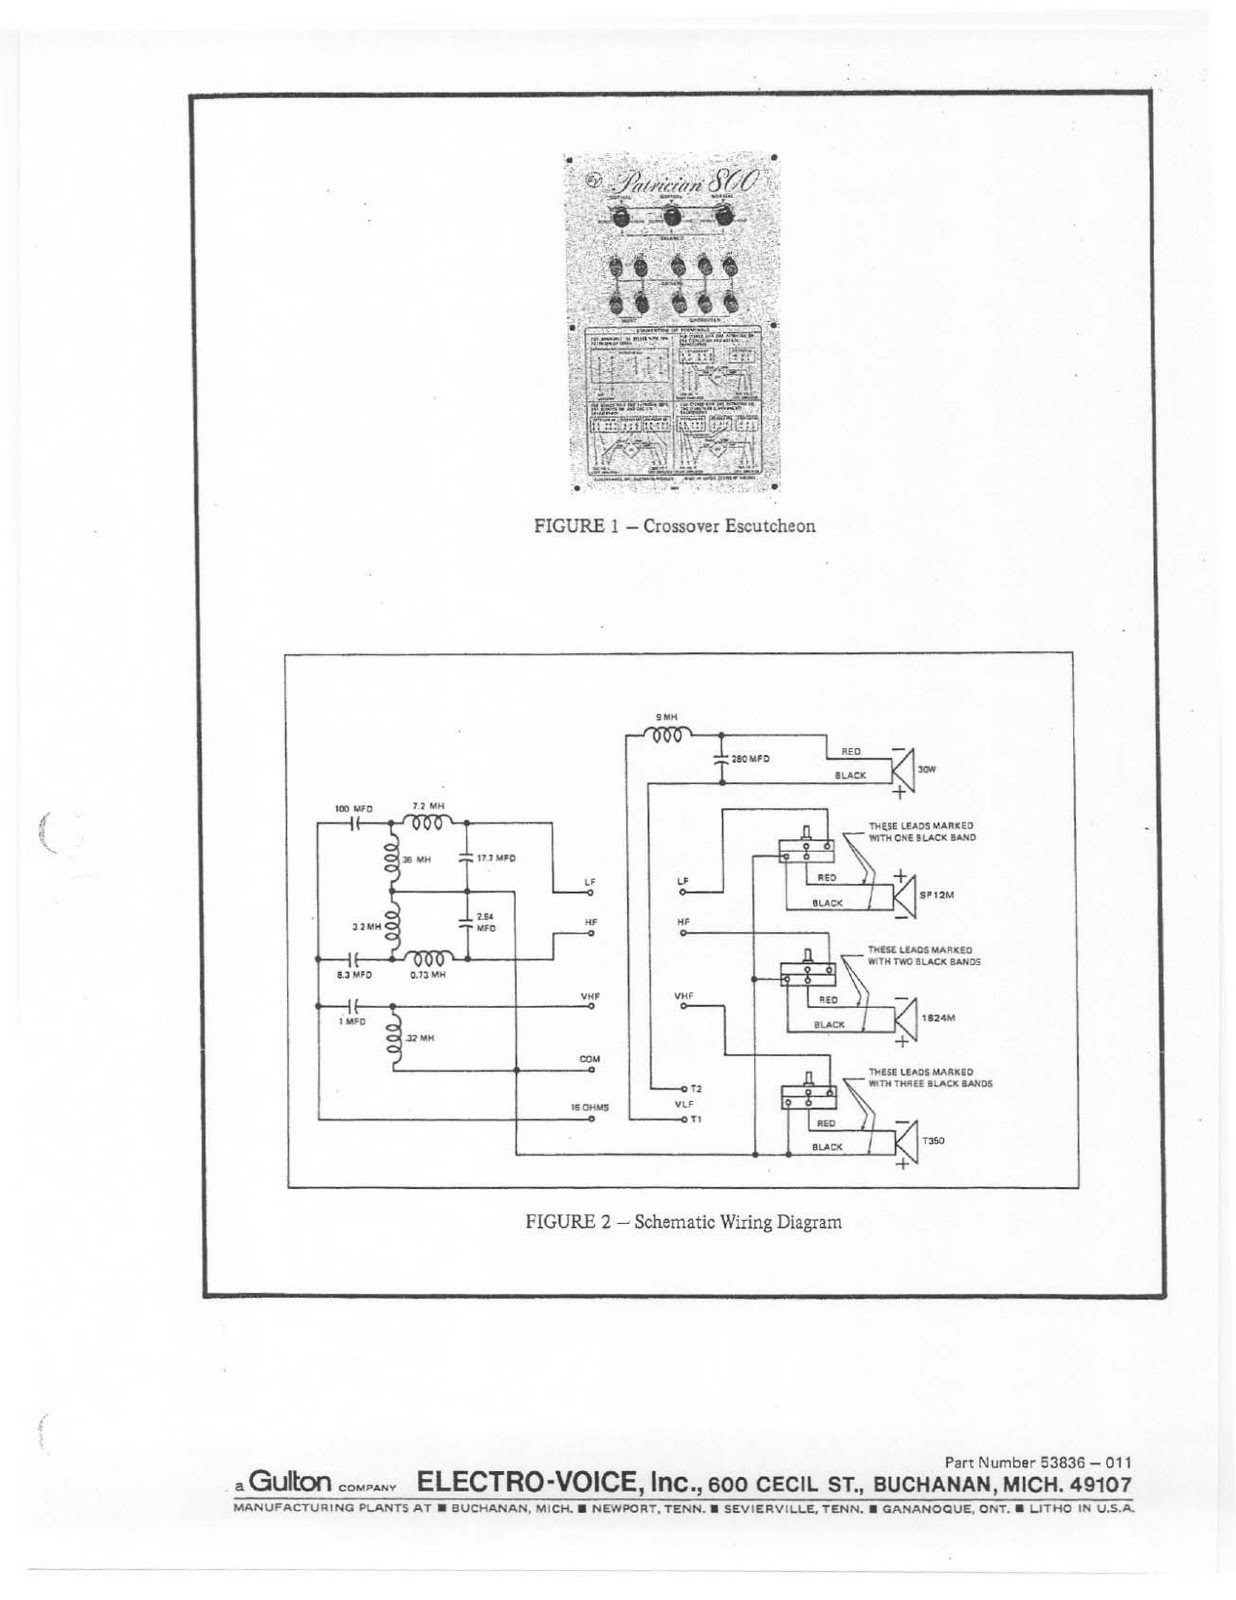 Retro Vintage Modern Hi Fi Electro Voice Patrcian 800 Wiring Diagram For Robert